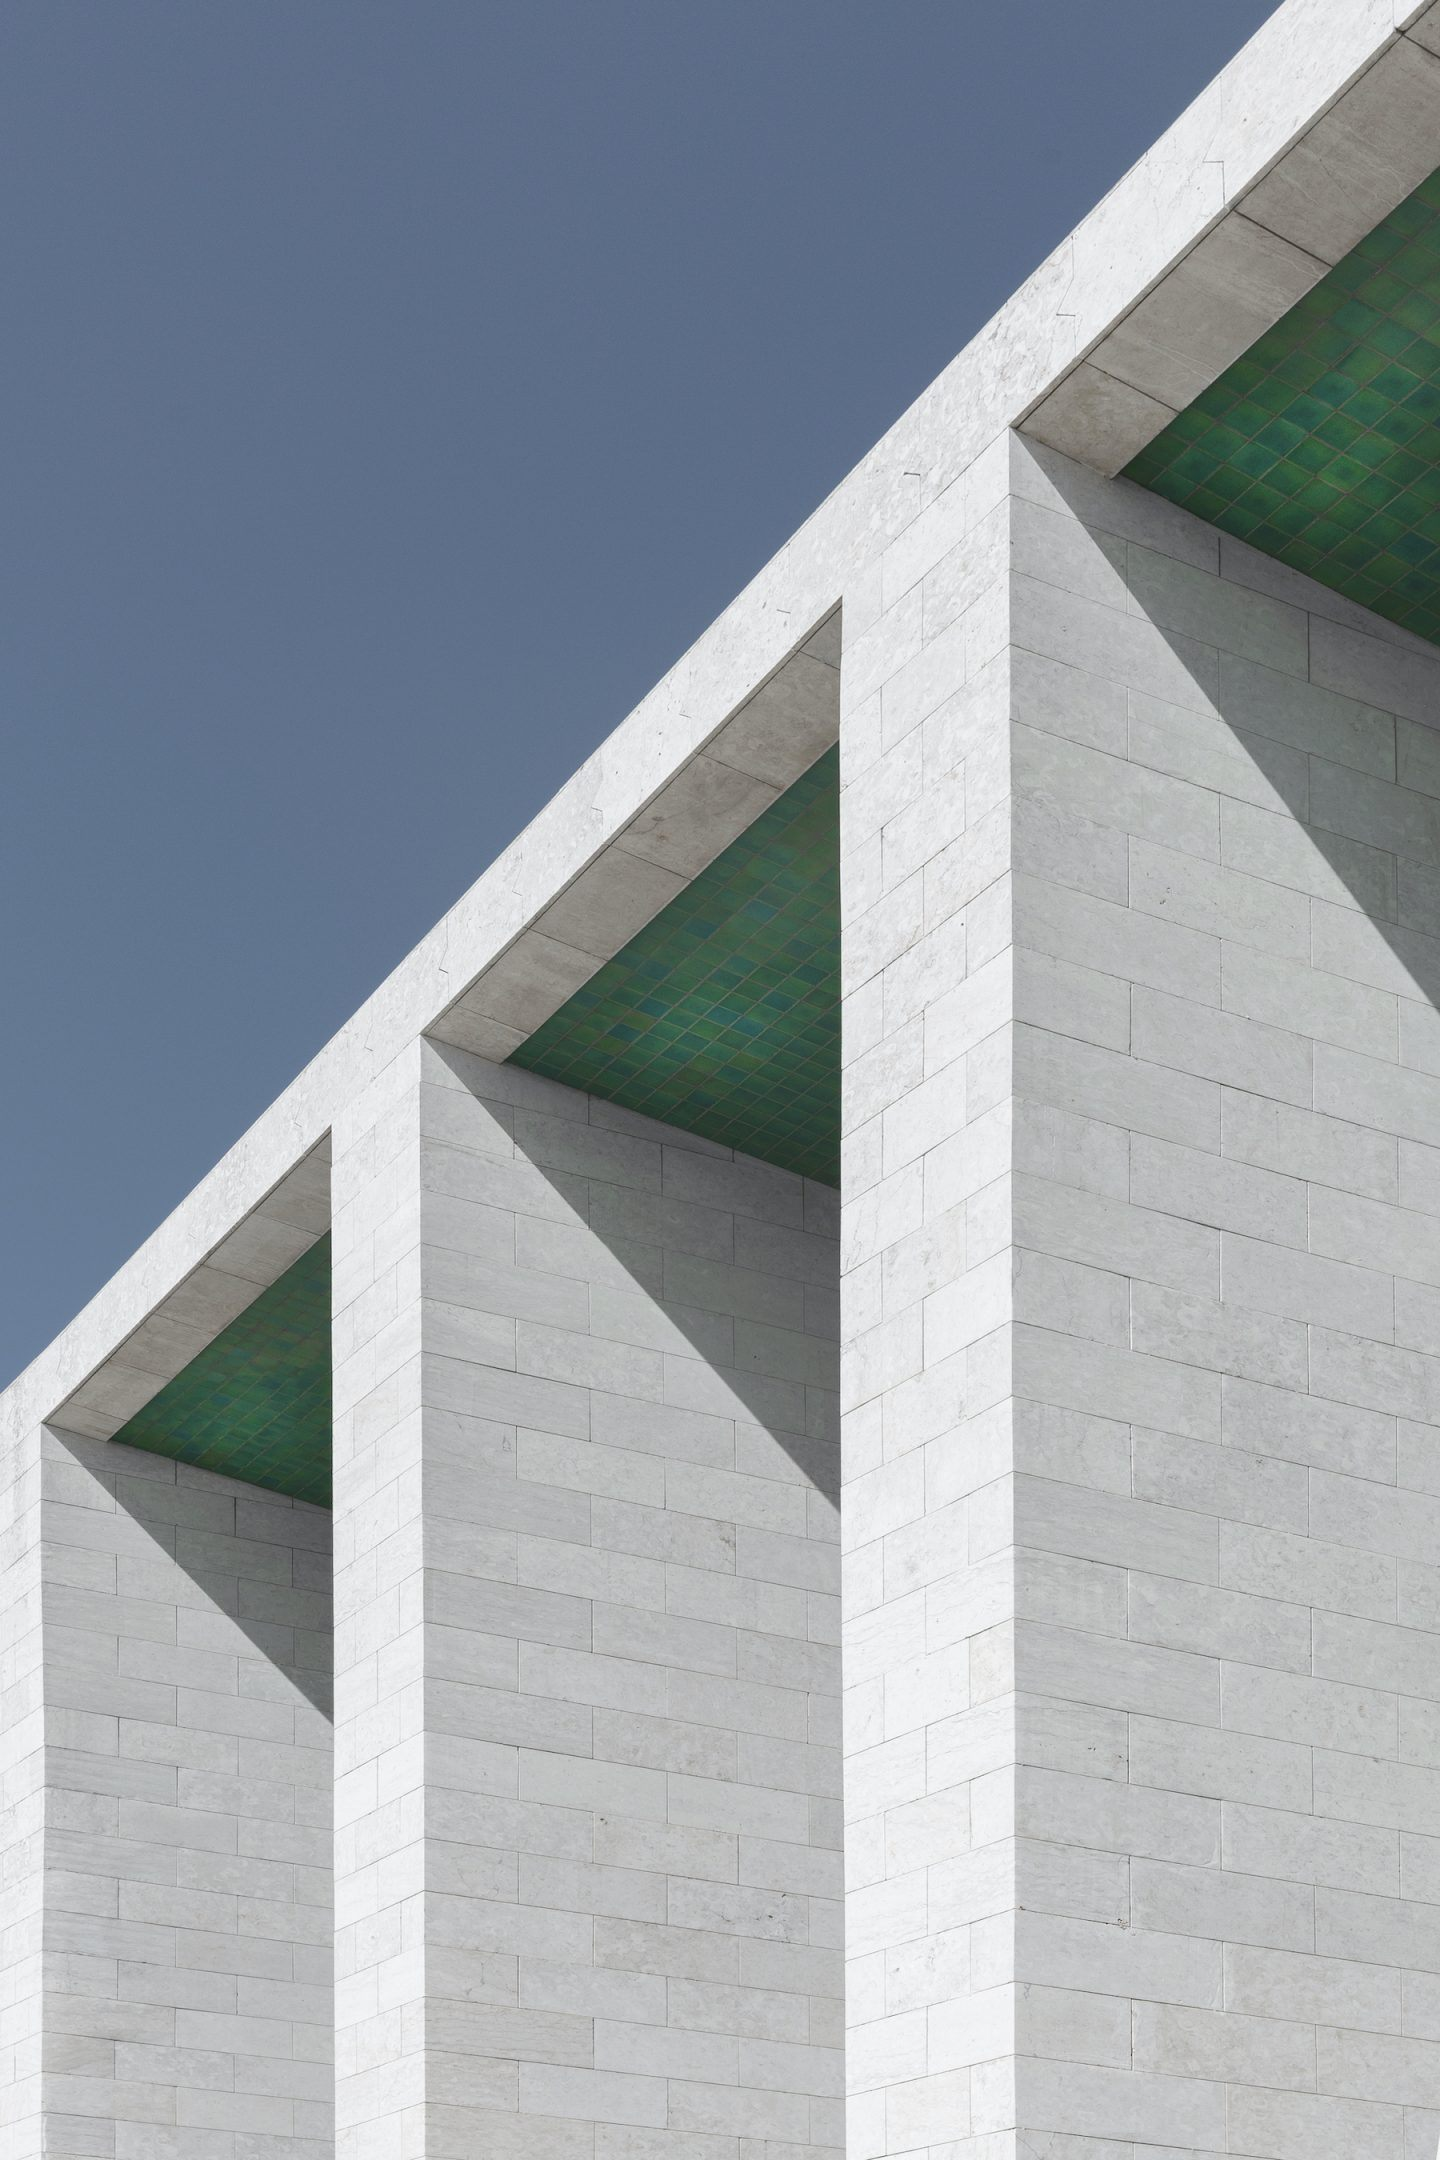 IGNANT-Architecture-Alvaro-Siza-Vieira-Portuguese-National-Pavilion-07